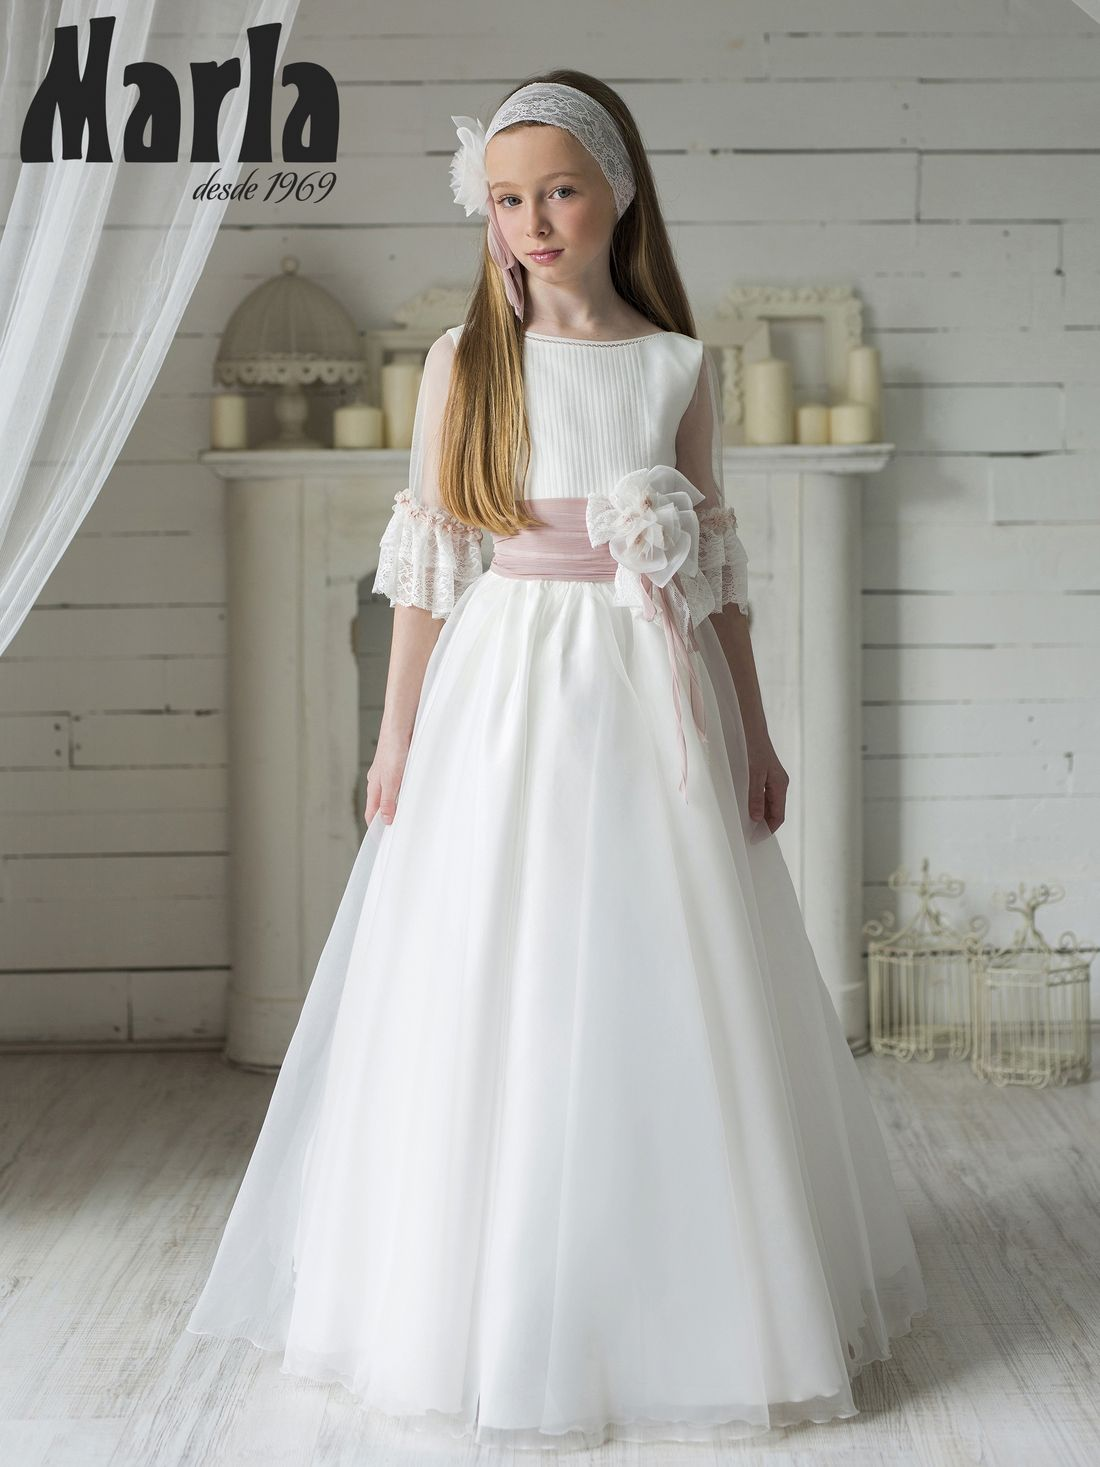 Vestido Comunión 2020 Marla Modelo K108 Vestidos De Comunión Vestidos Comunion Niña Vestido Floral Para Chicas